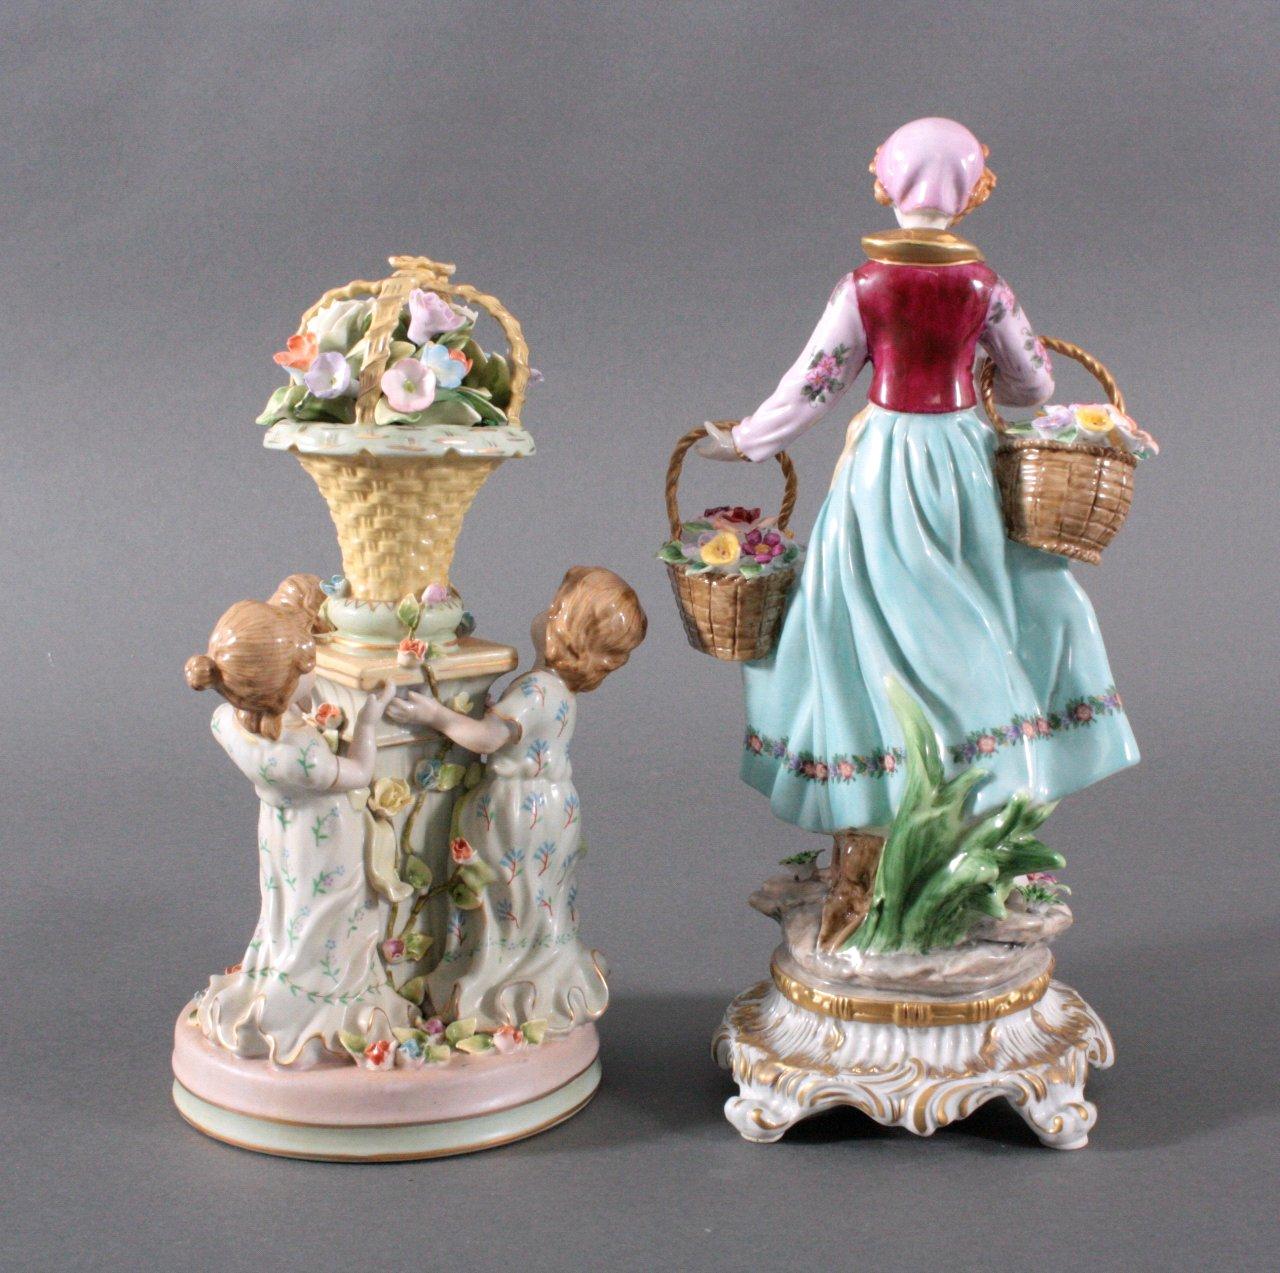 2 Porzellanskulpturen, Fanatsiemarken-1